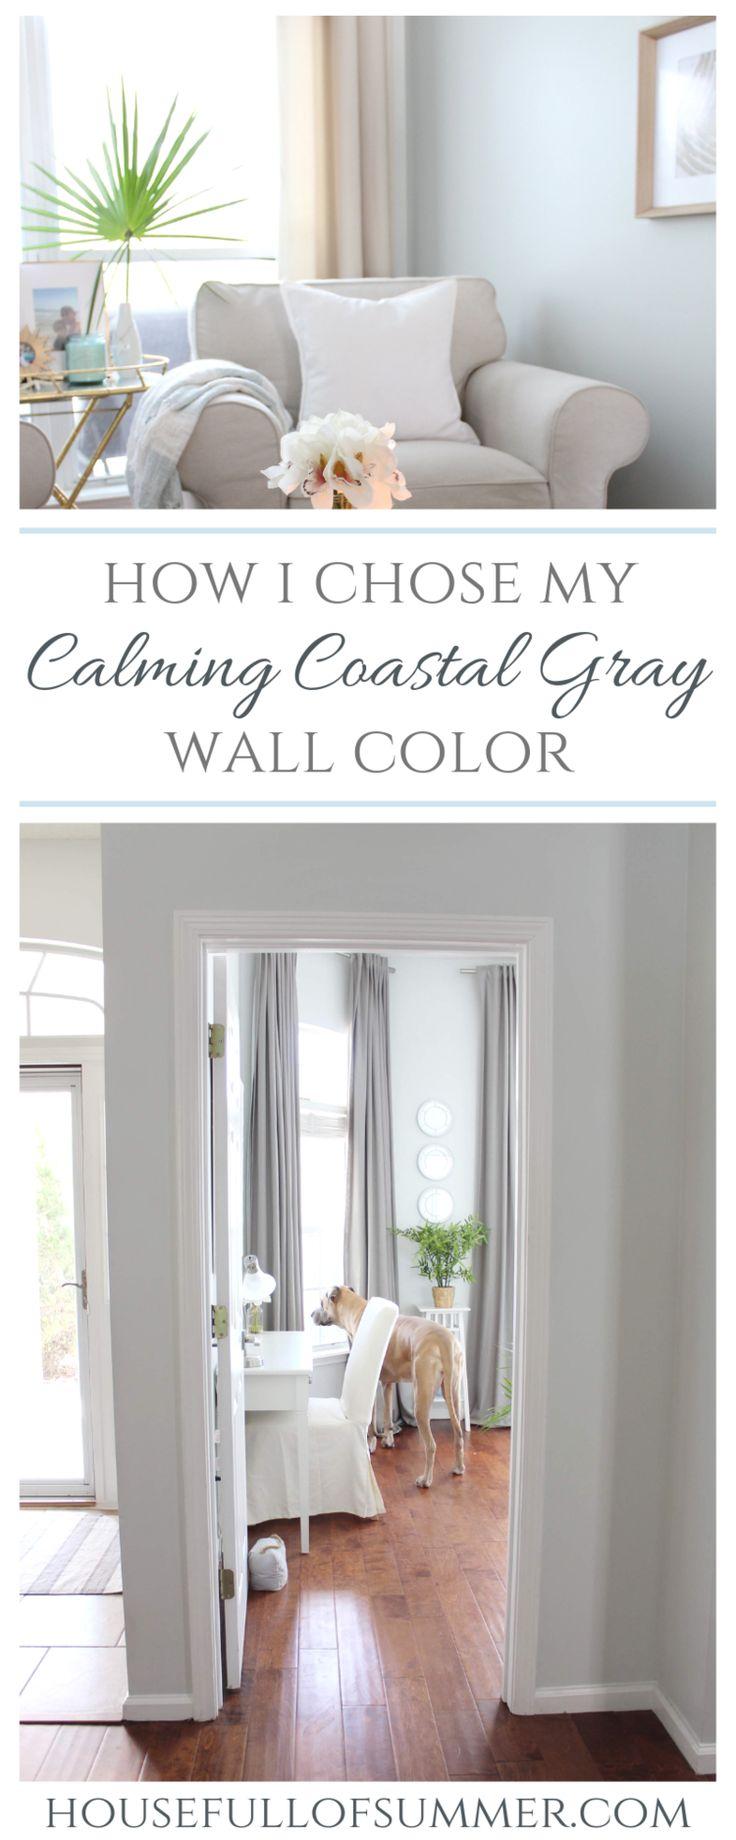 how i chose my calming coastal gray wall color grey wall on interior wall colors id=45548